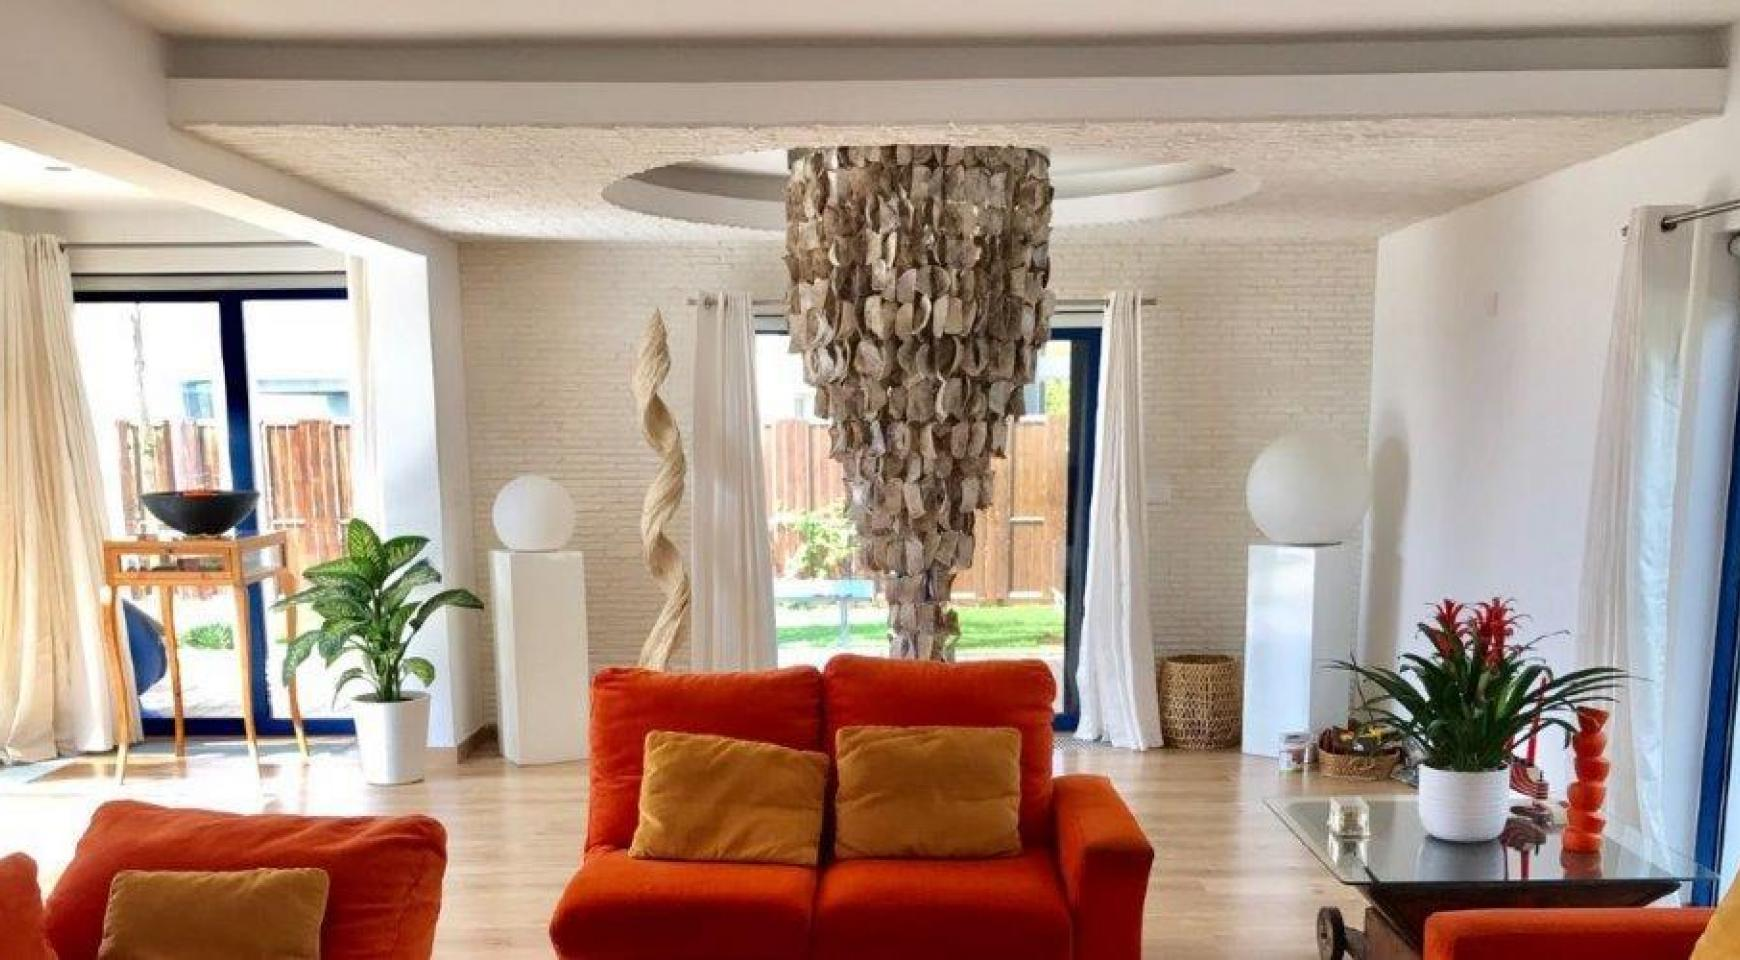 5-Спальная Вилла с видом на Море в районе  Agios Tychonas - 15